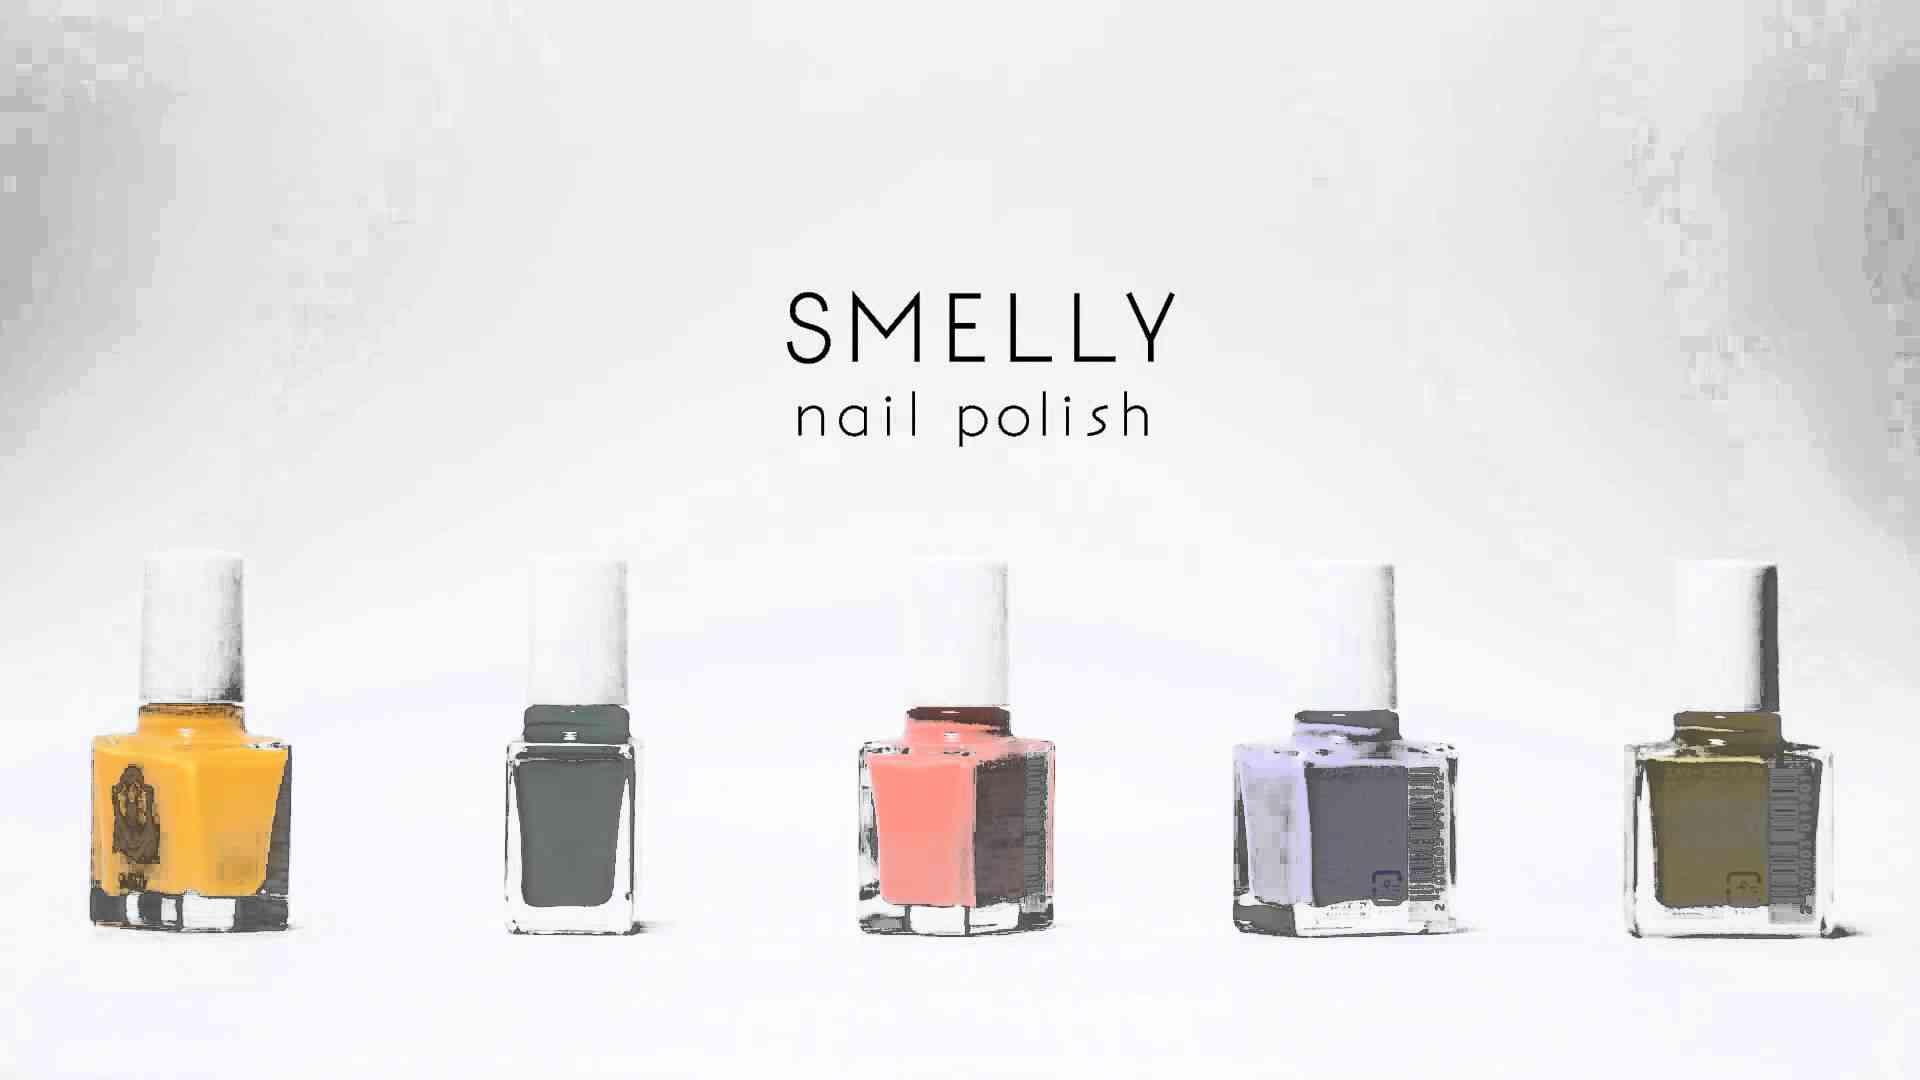 SMELLY nail polish - YouTube